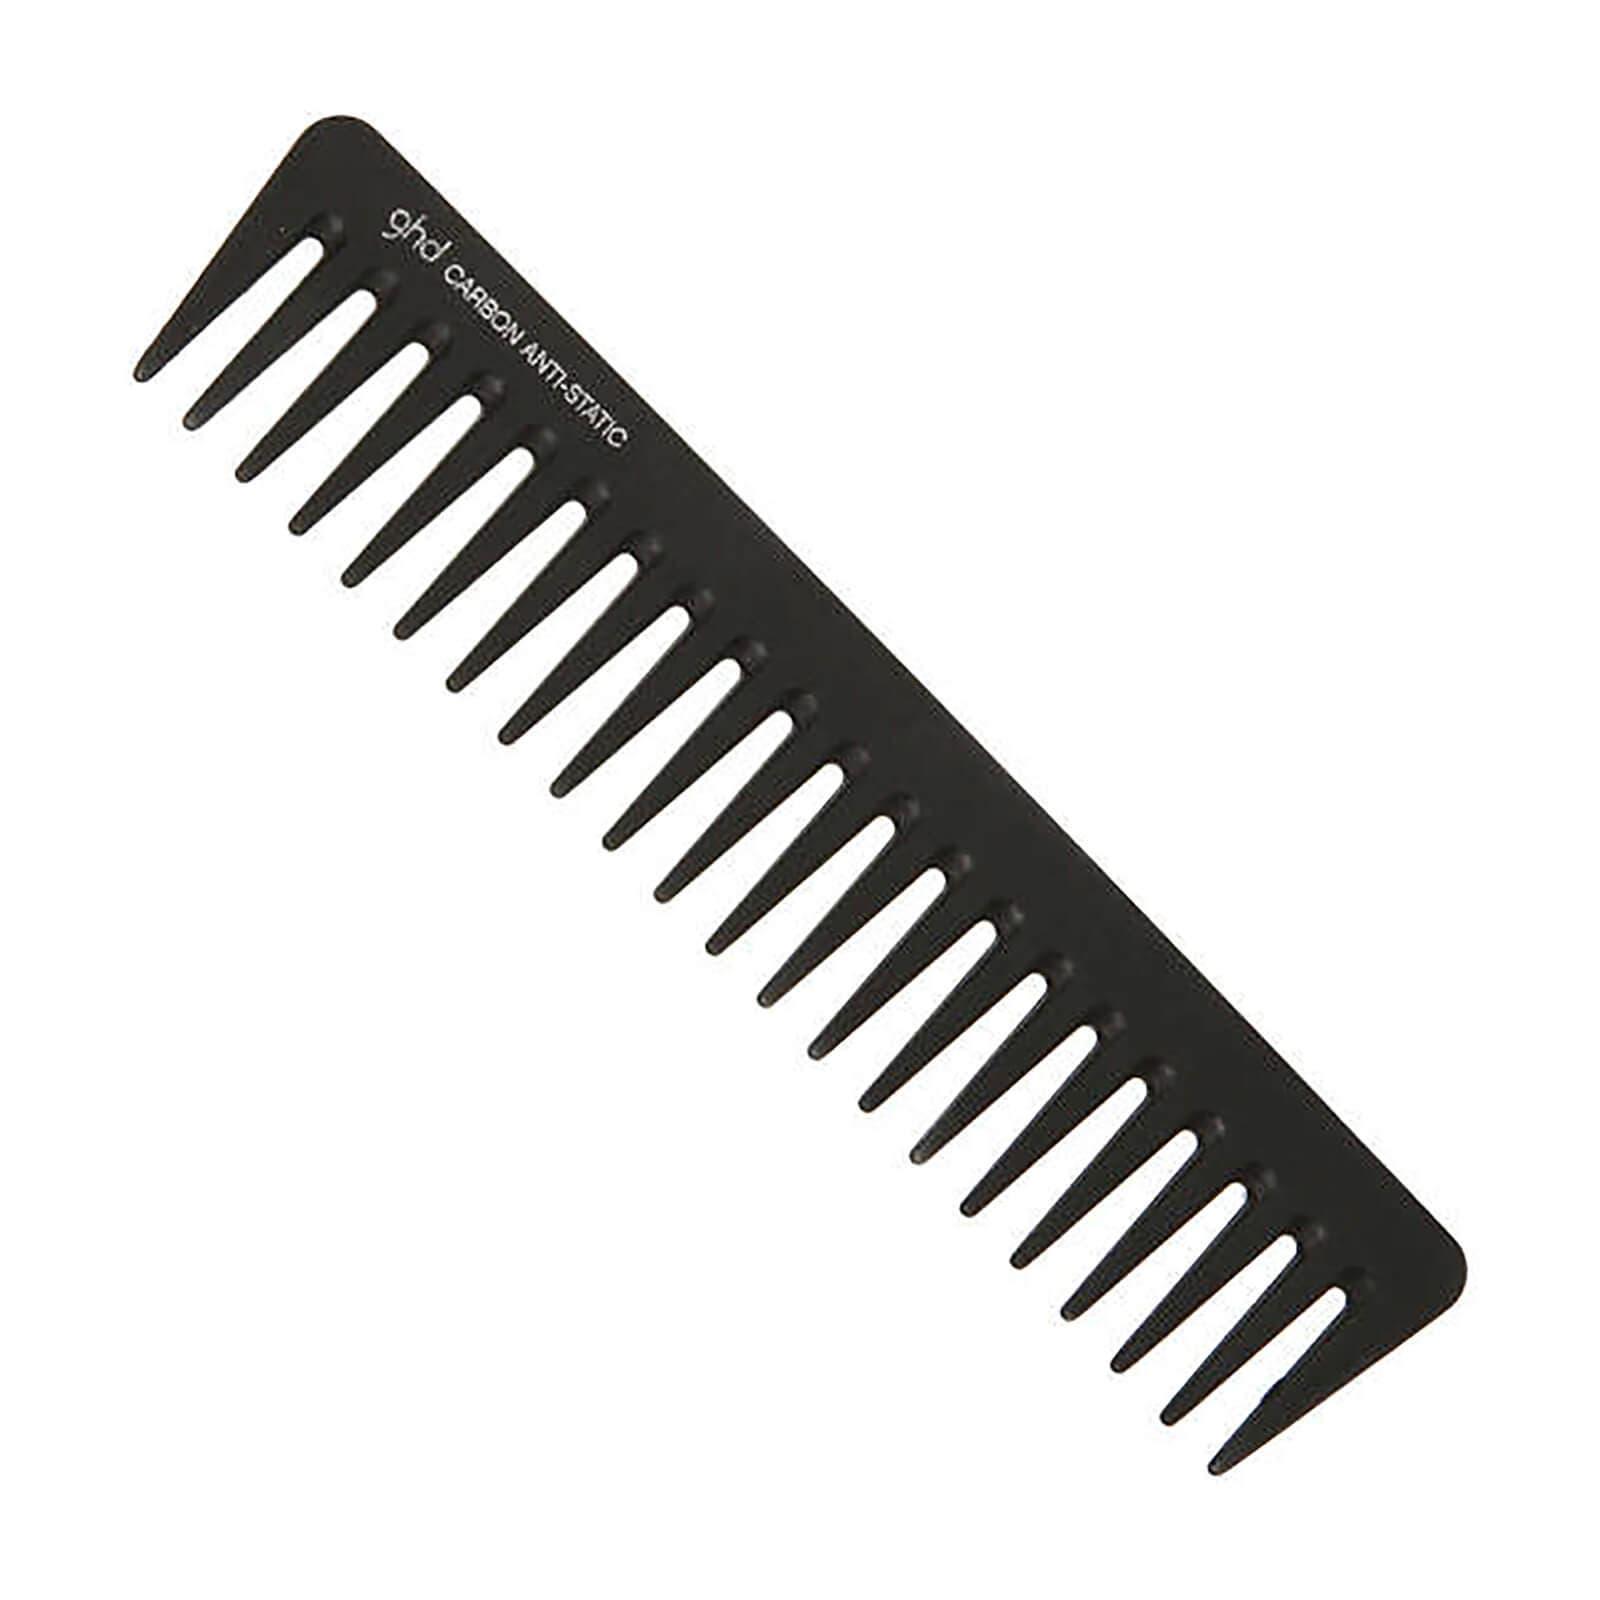 ghd Detangling Comb. 19 cms